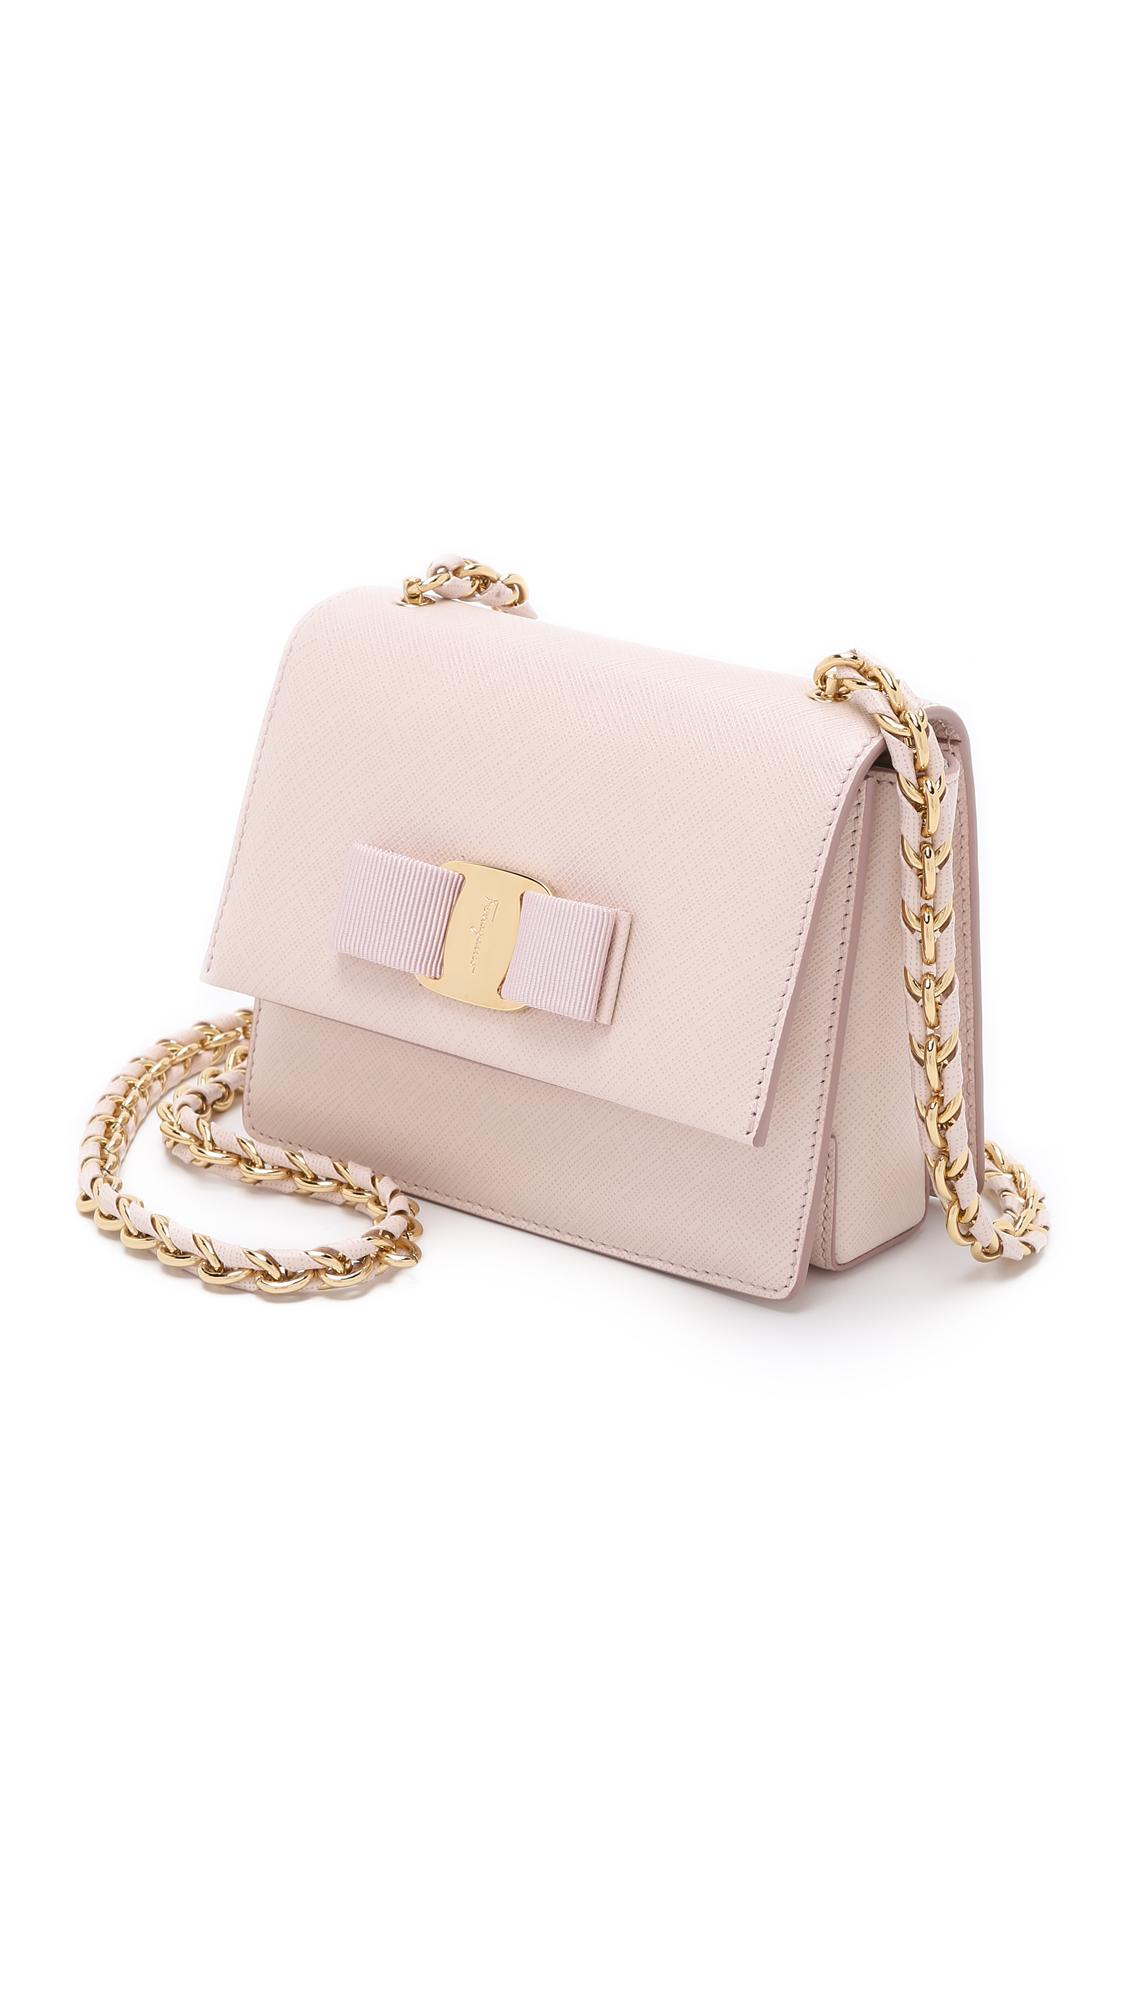 46cacfb679db Salvatore Ferragamo Mini Ginny Bag